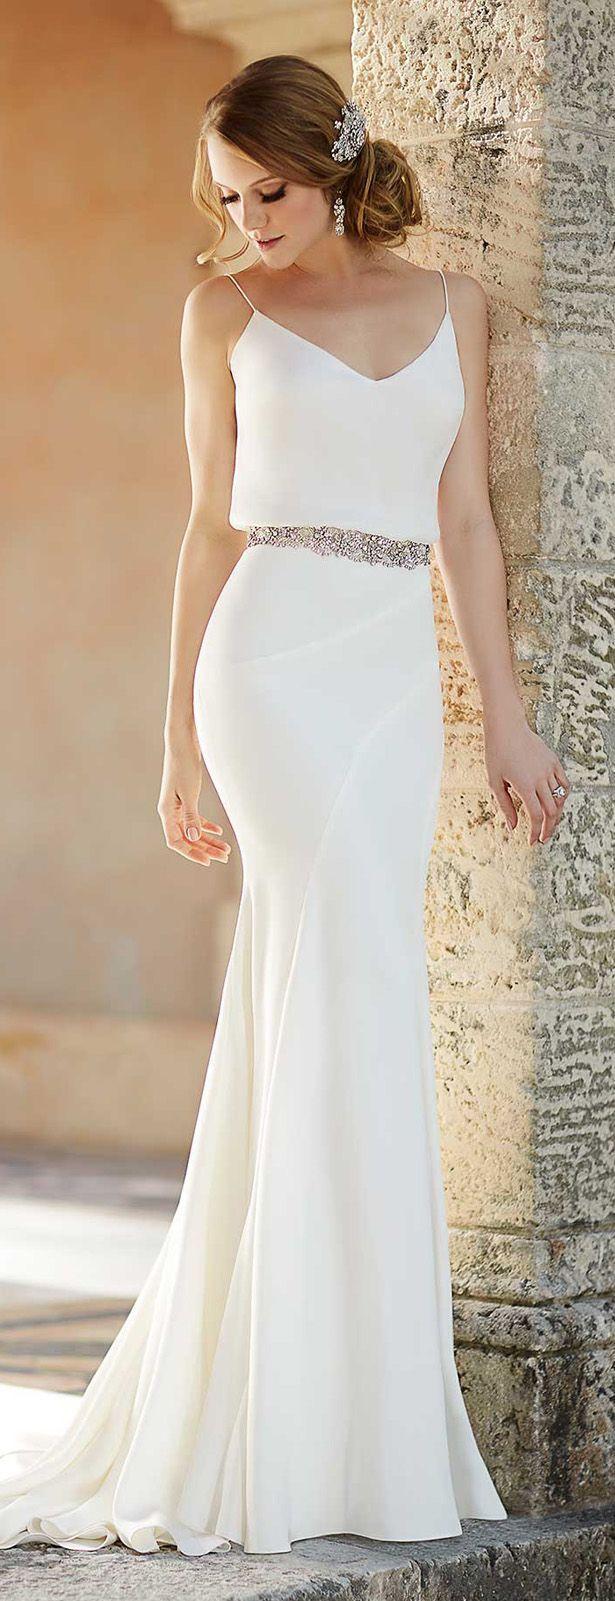 Martina Liana Spring 2016 Bridal Collection Simple Classy Wedding DressWedding